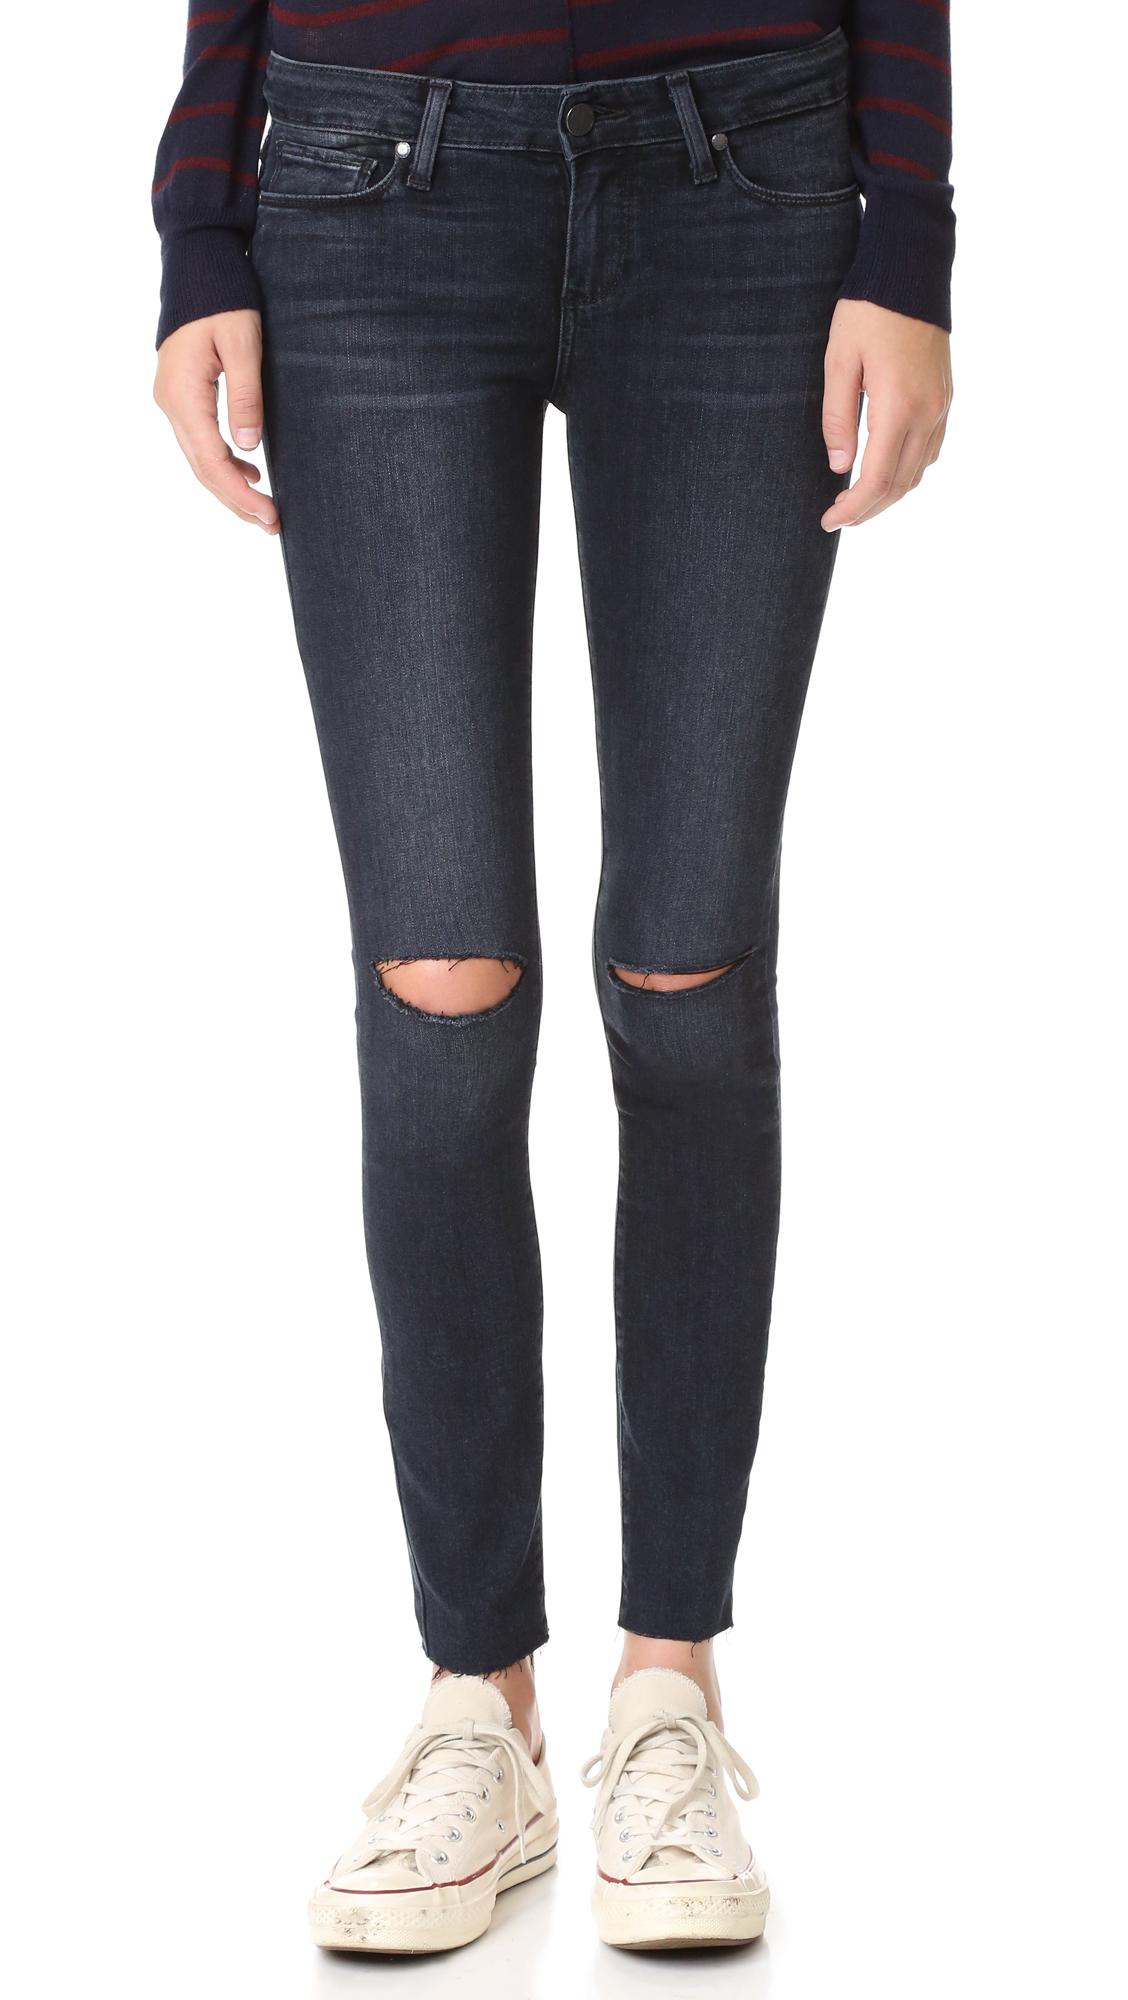 paige denim female paige verdugo ankle skinny jeans kaleea destructed